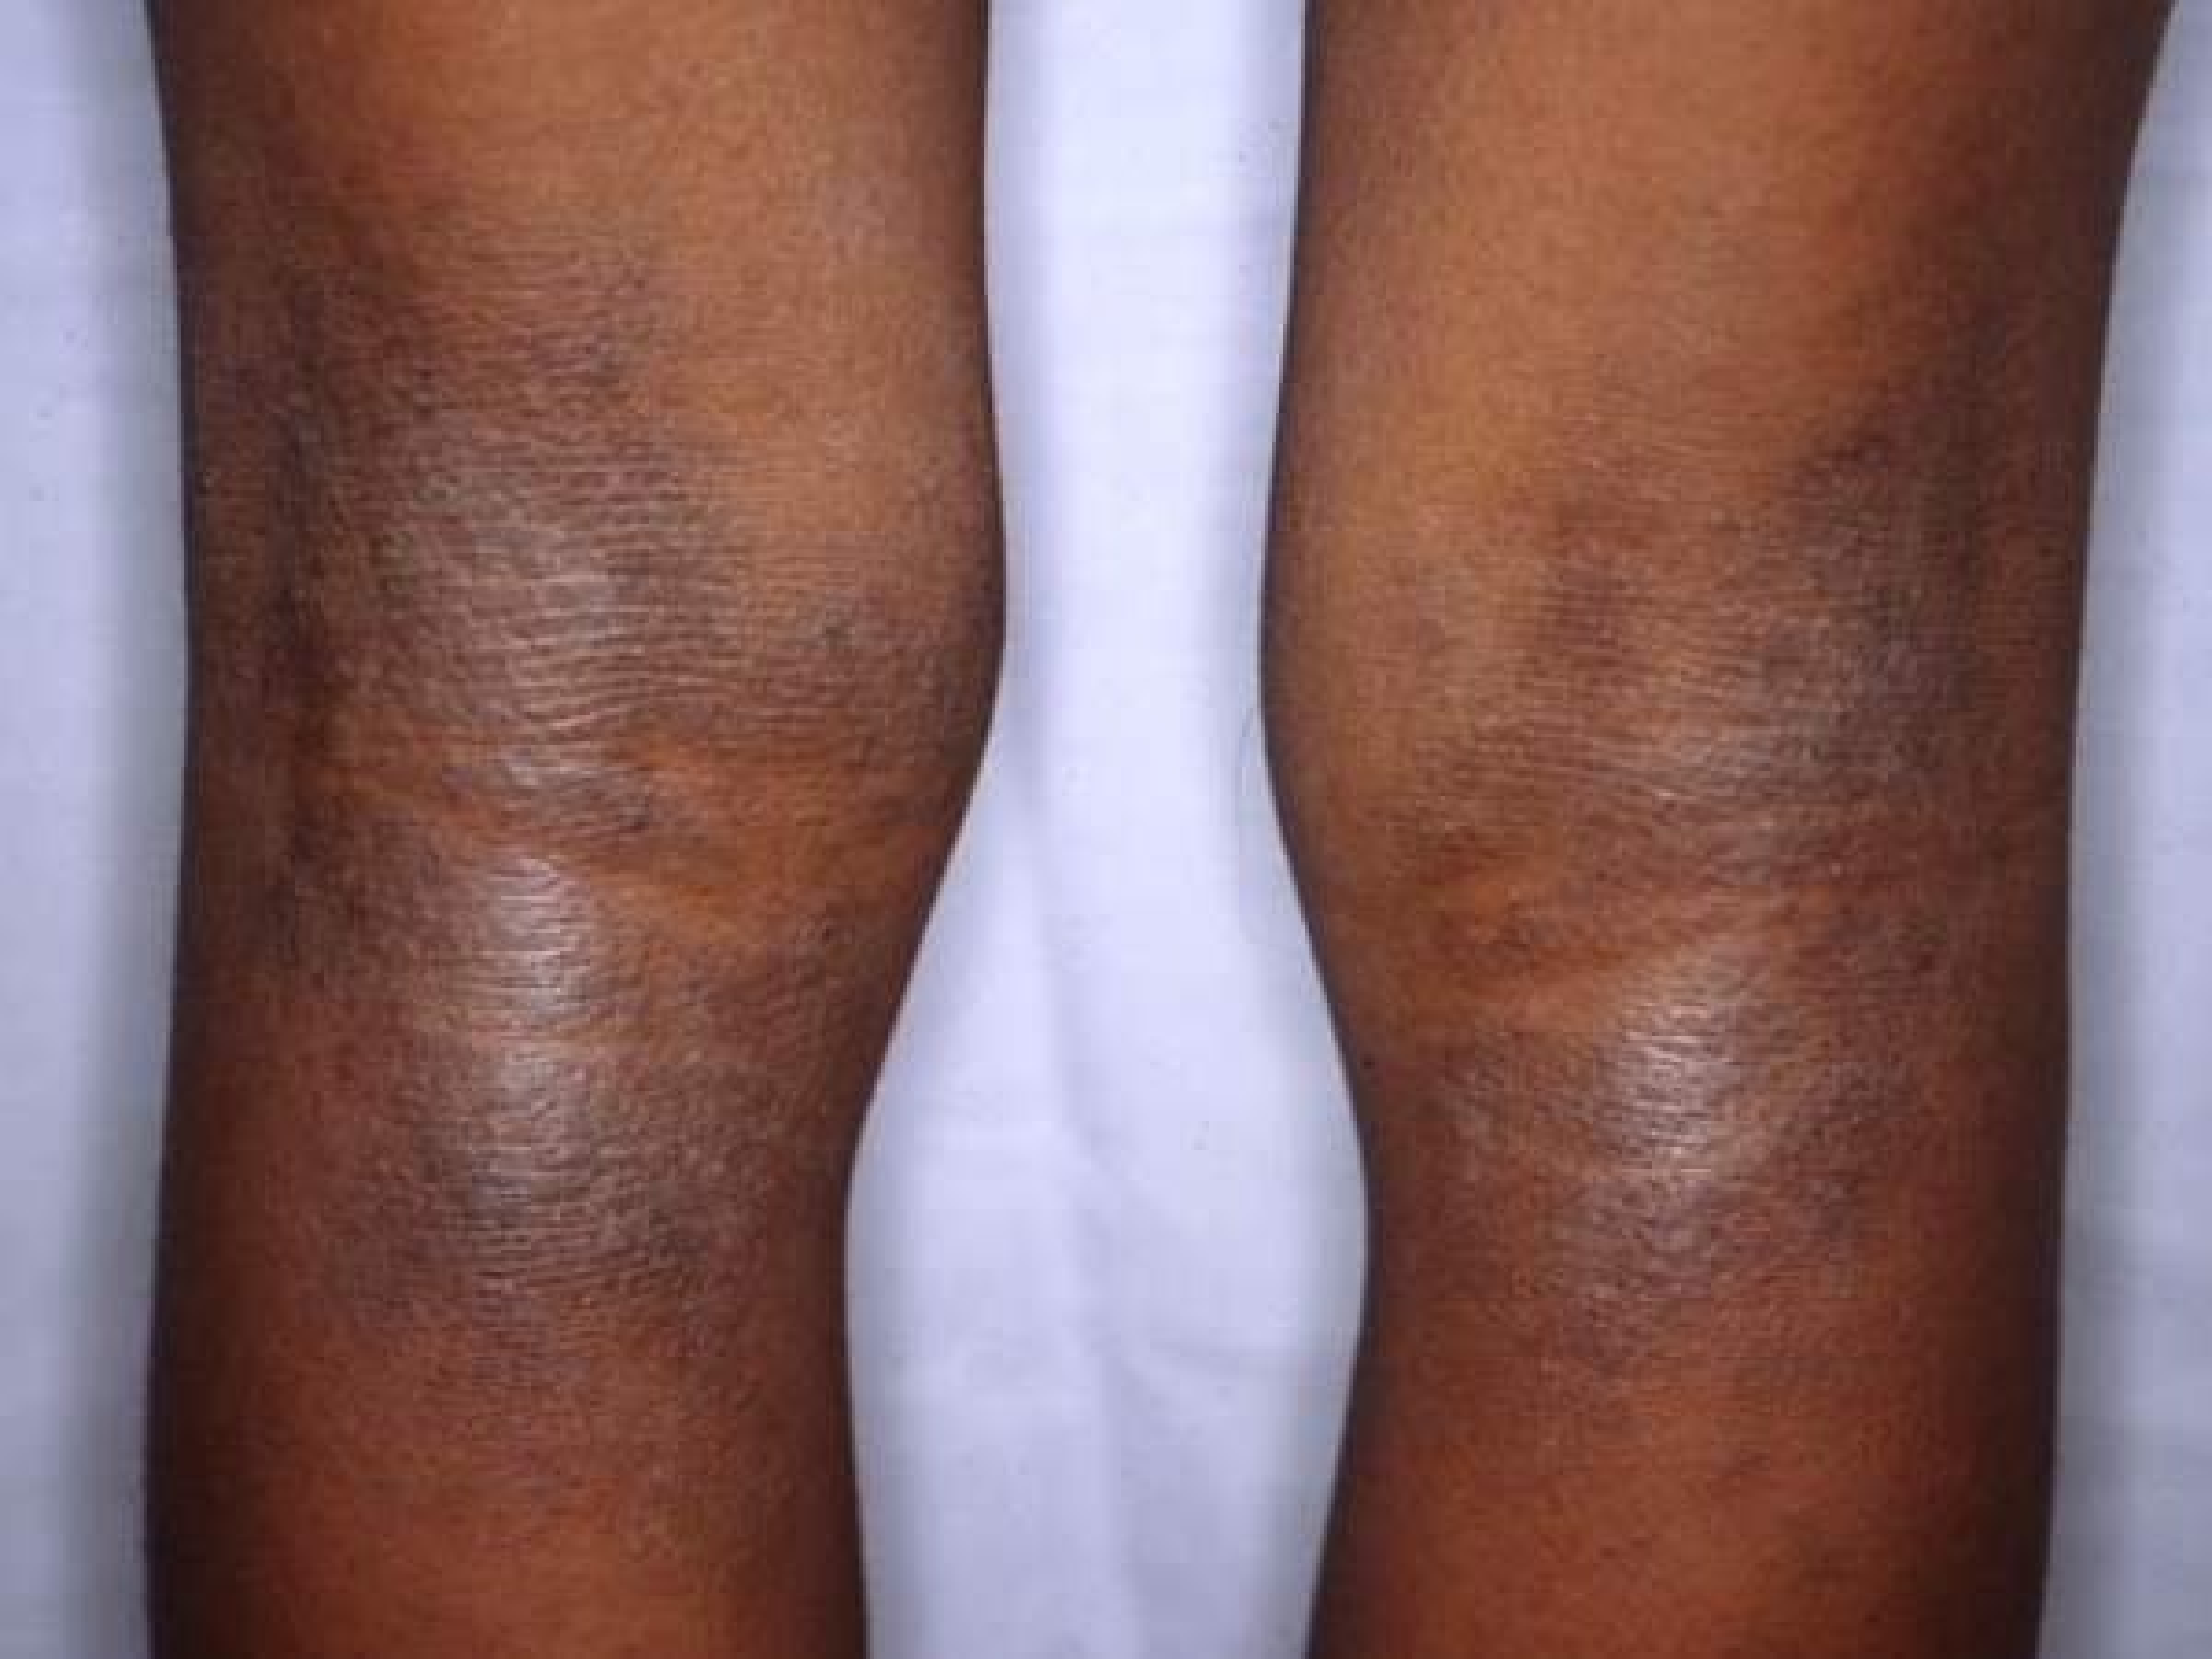 : National Eczema Society